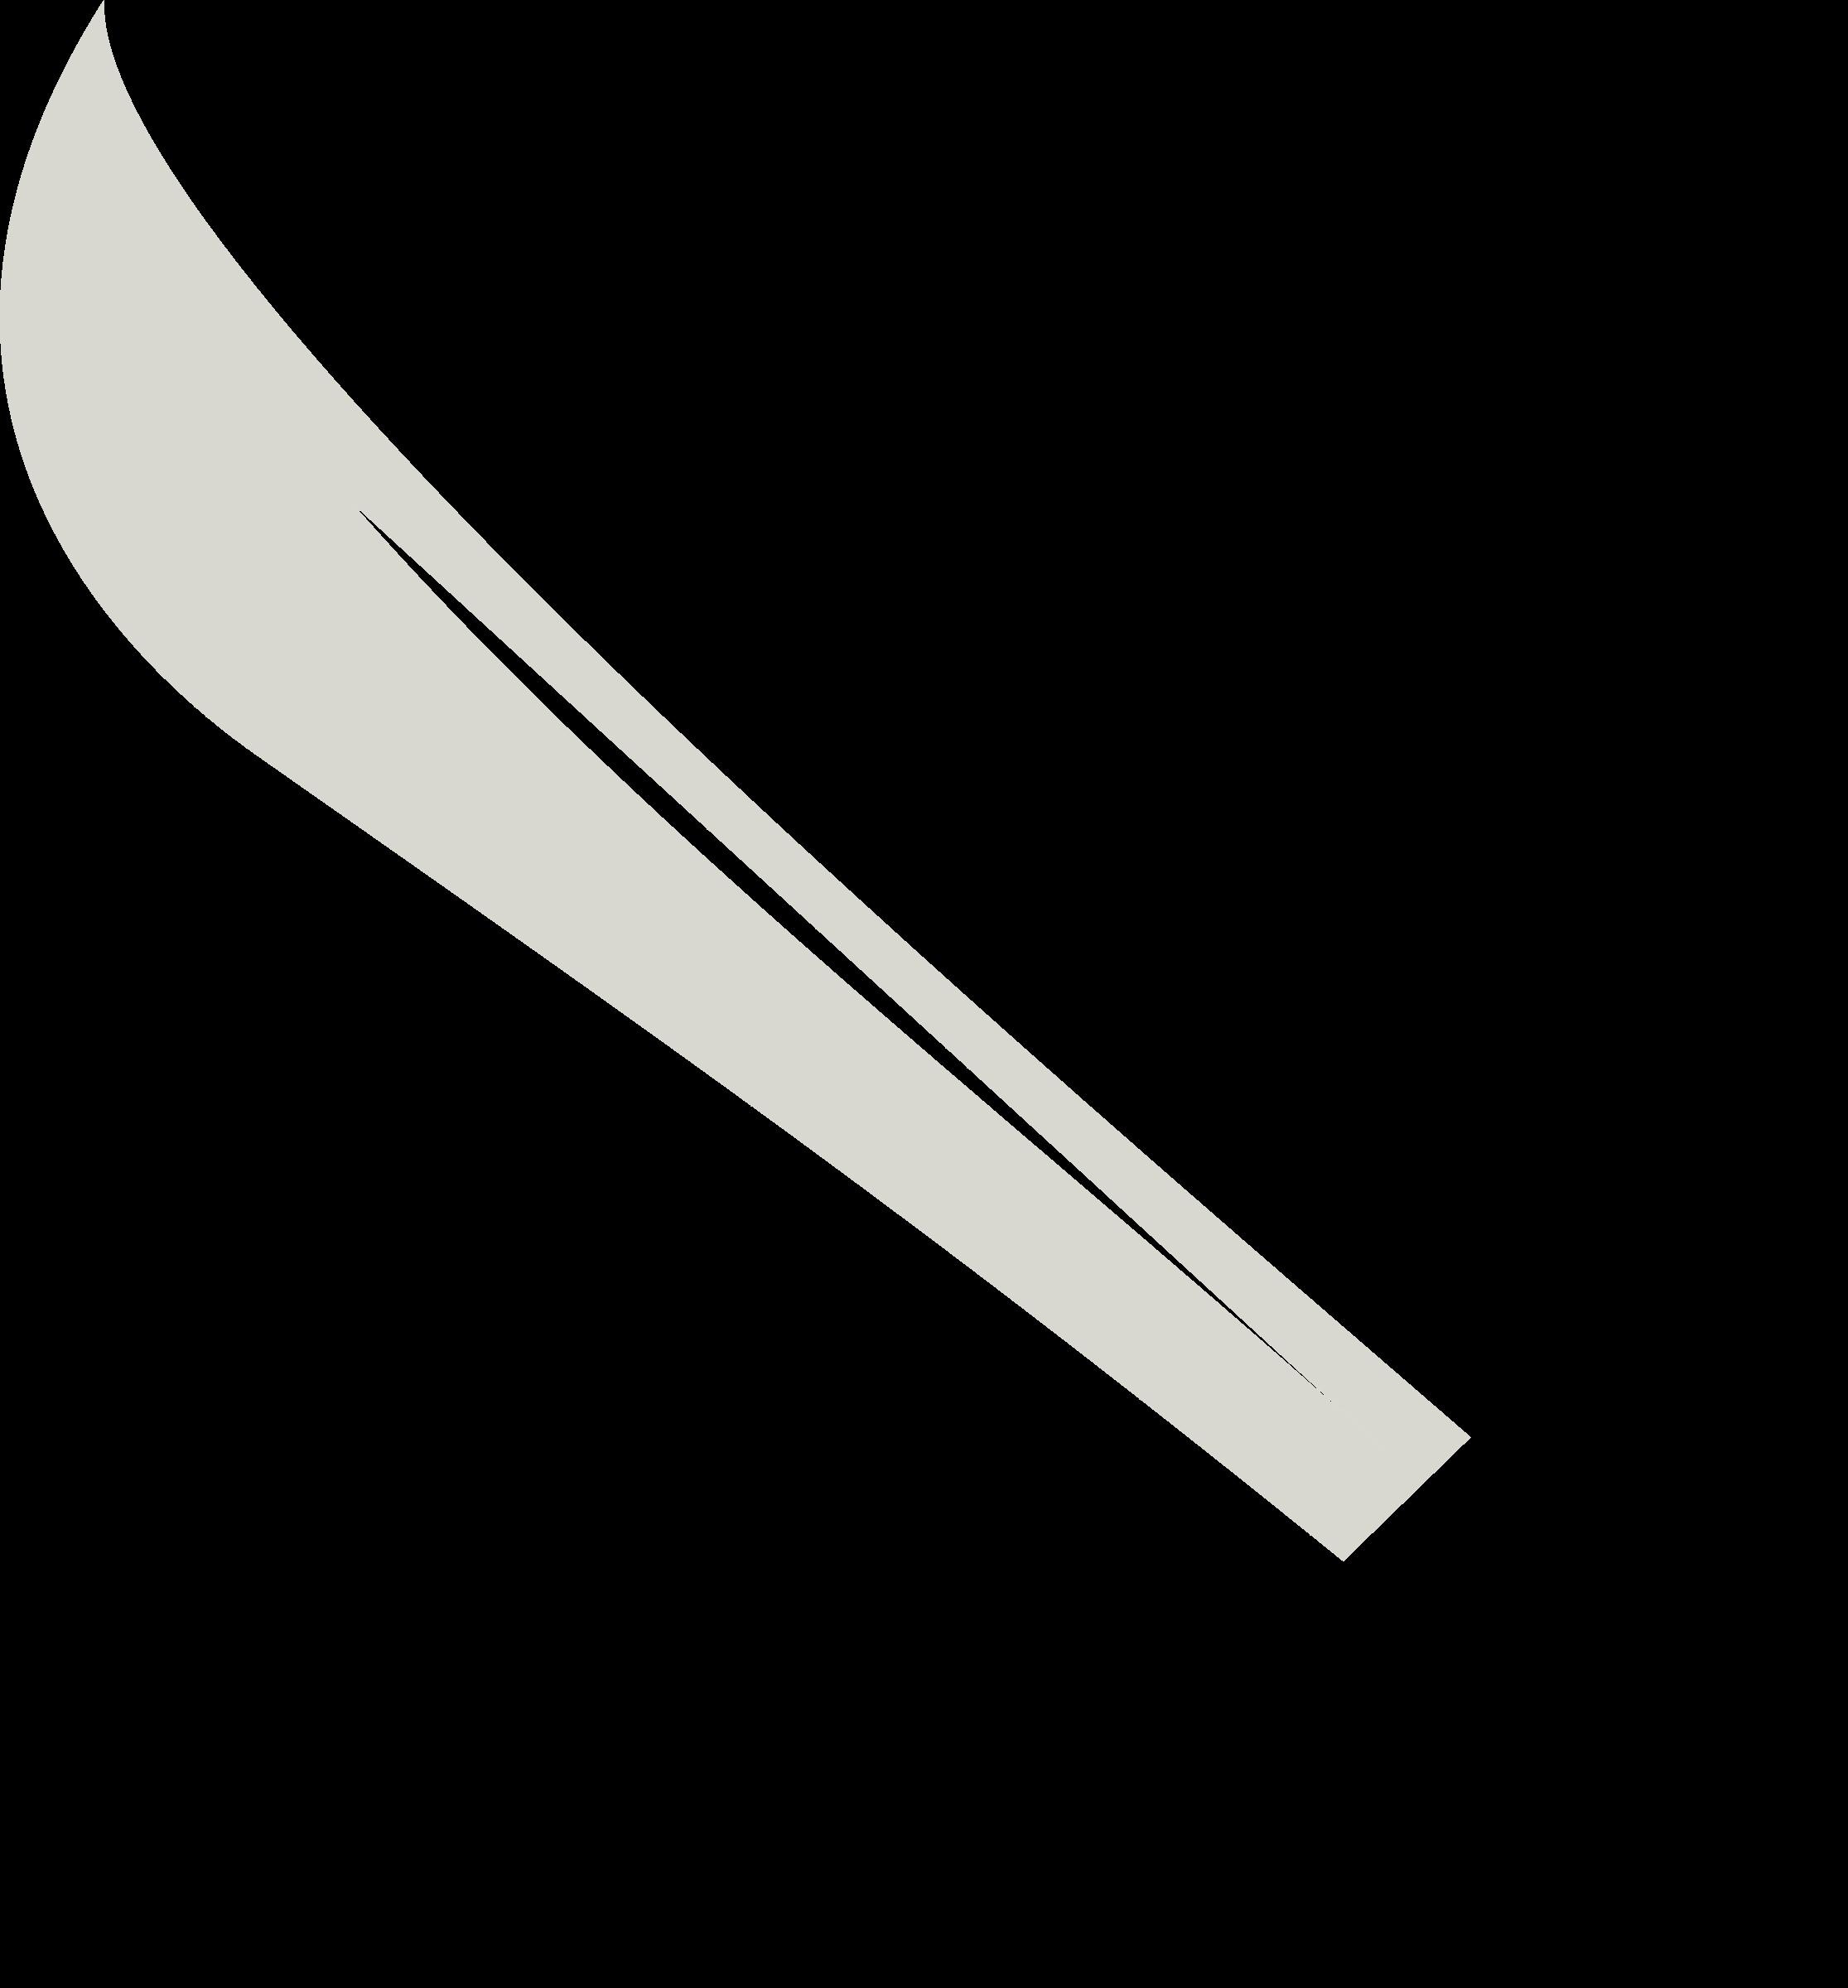 Hunting clipart knife. Machete cliparts zone